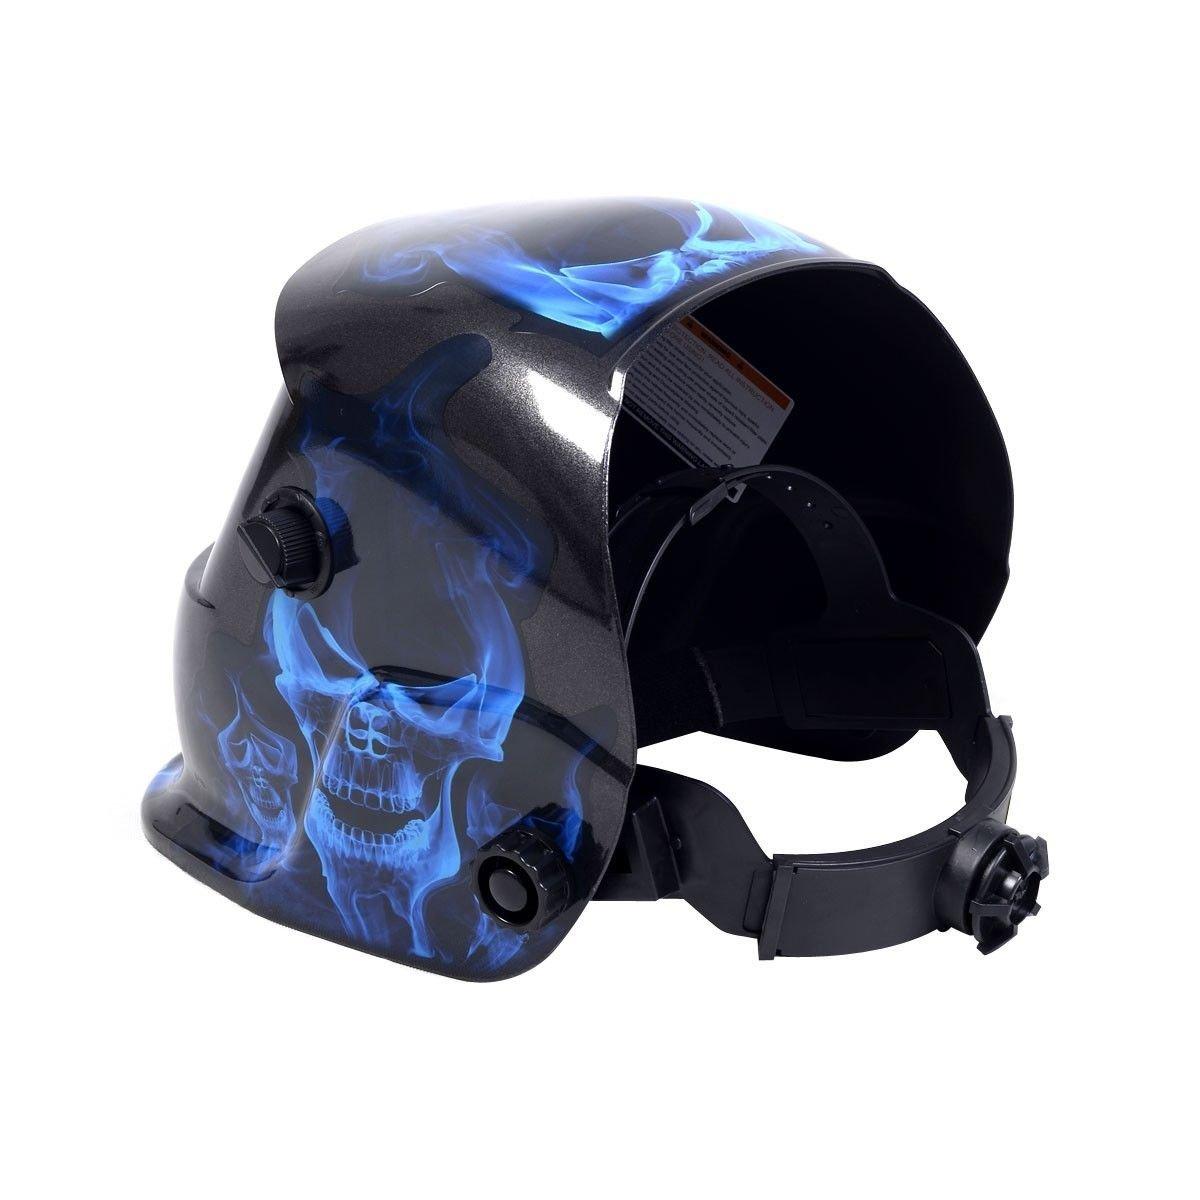 New Pro Solar Welder Mask Auto-Darkening Welding Helmet Arc Tig mig grinding - Skull - - Amazon.com